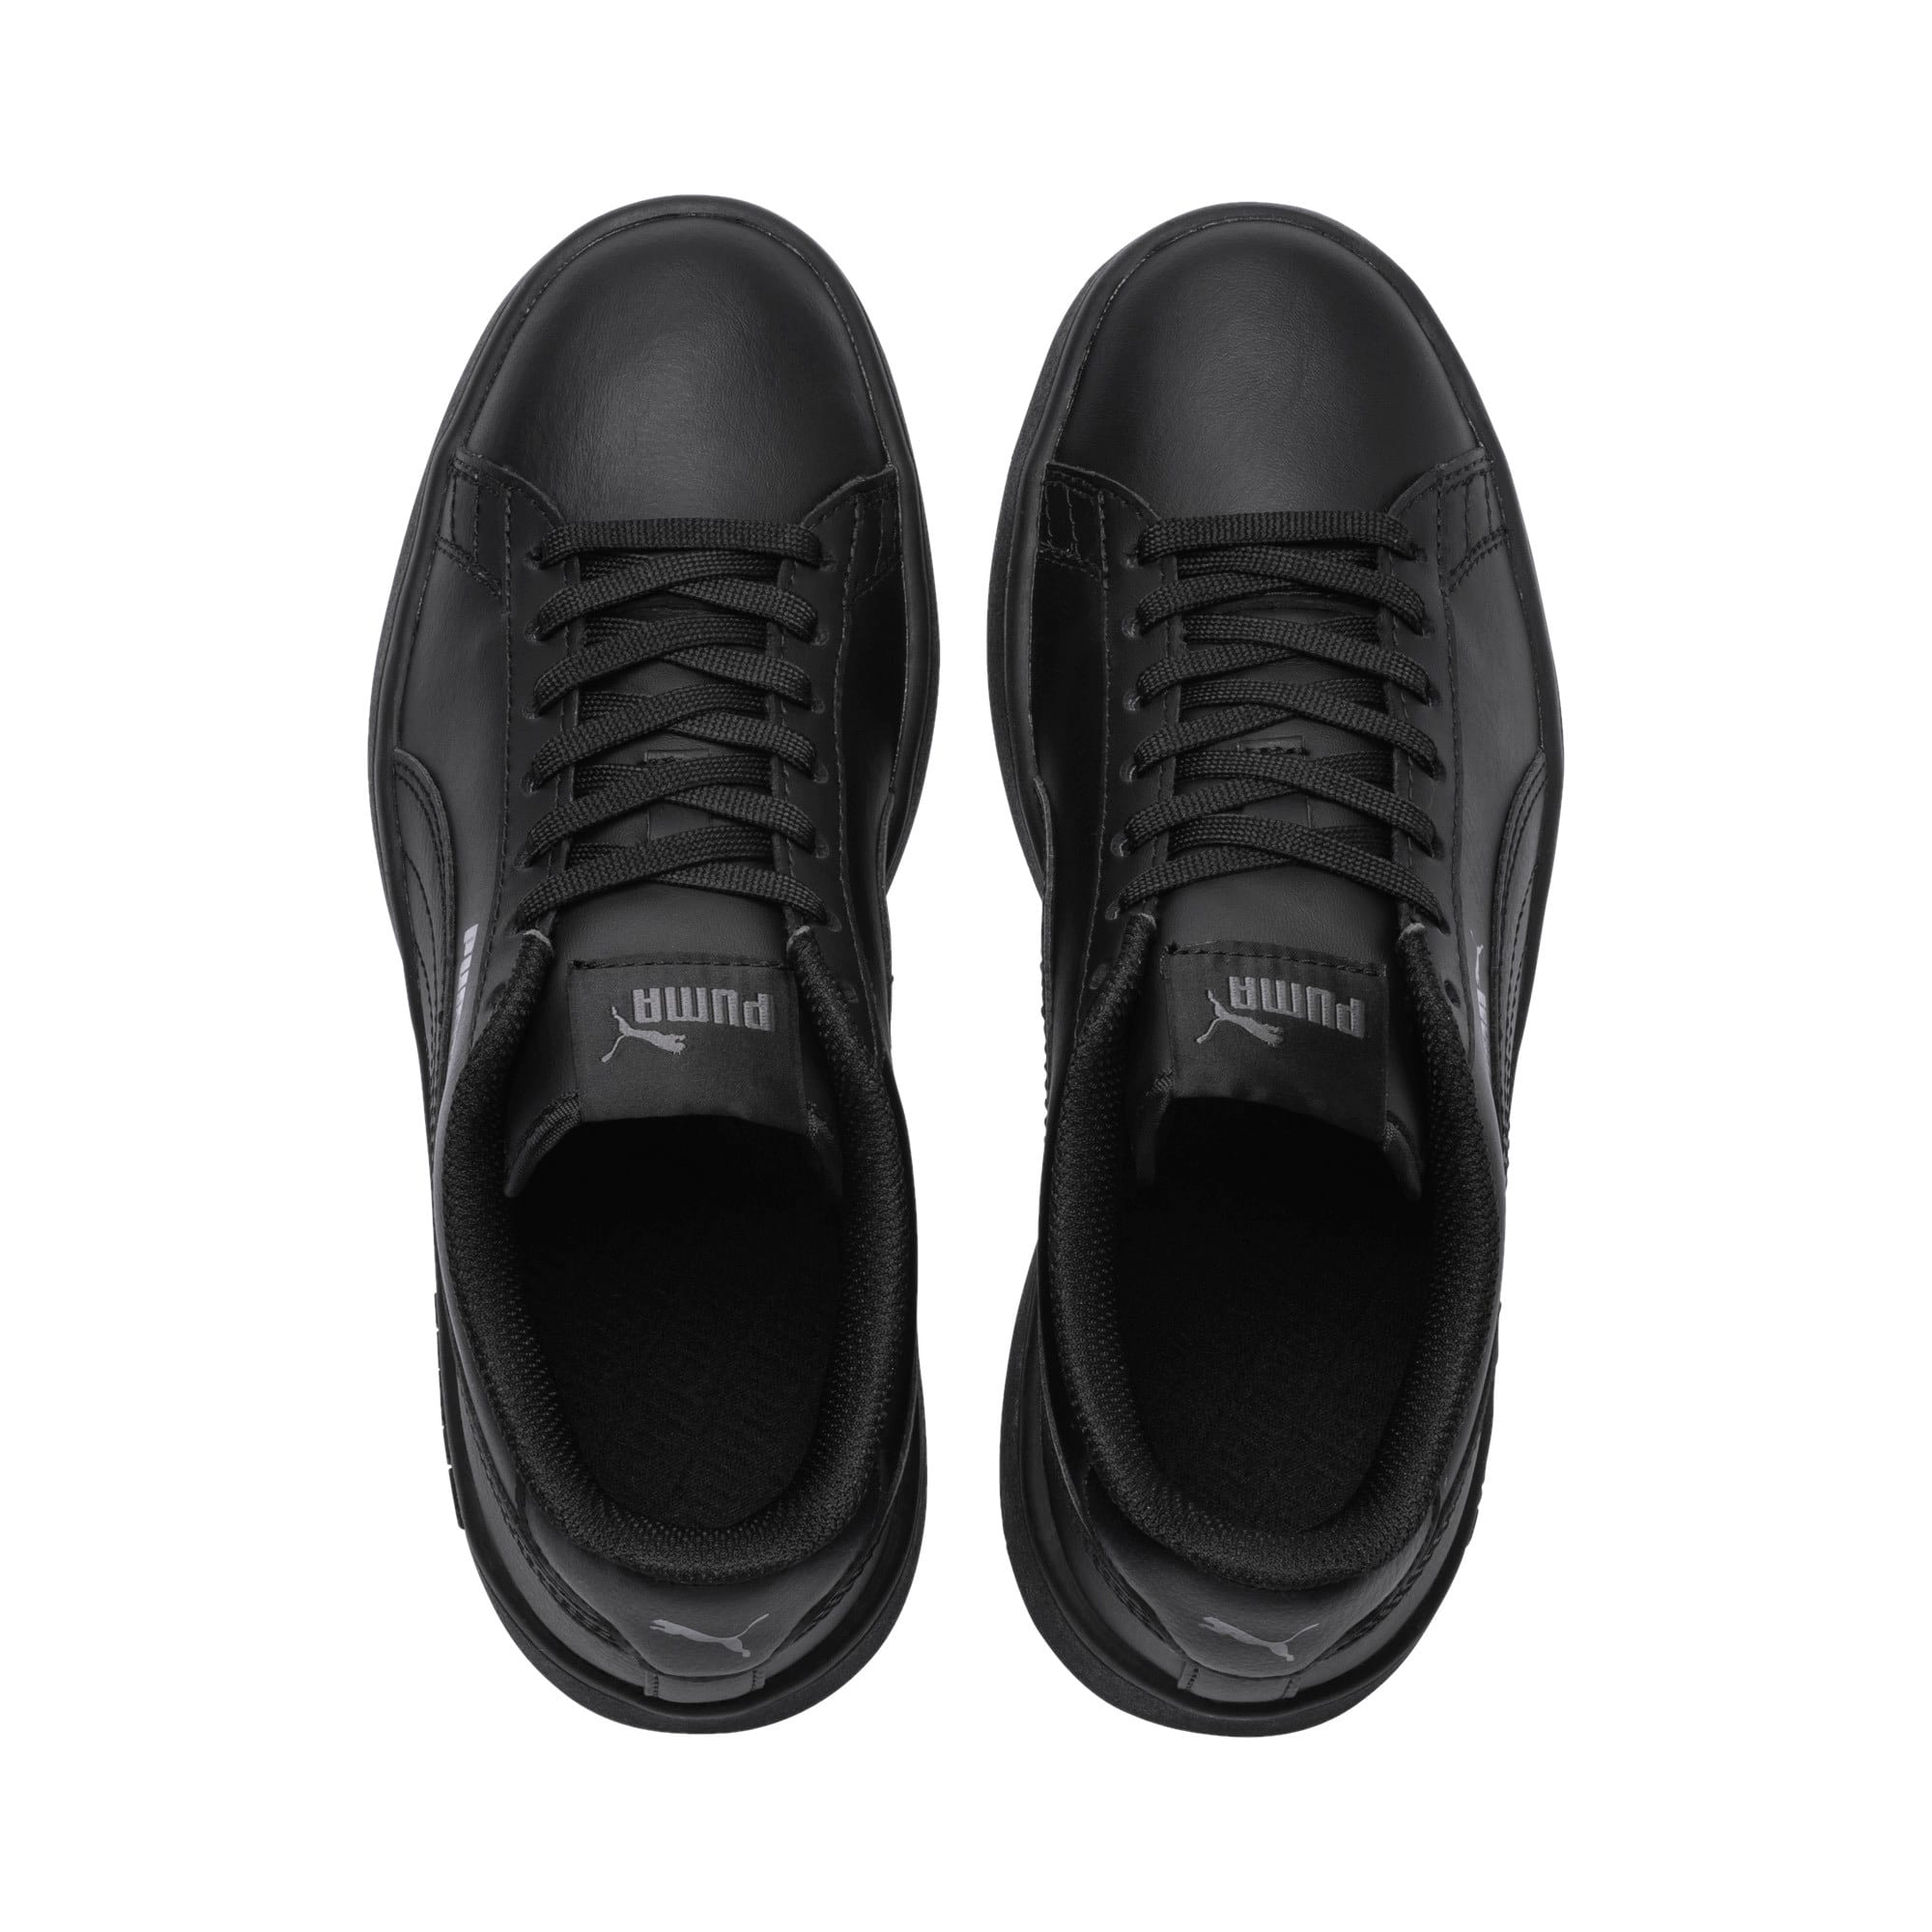 Thumbnail 6 of PUMA Smash v2 Leather Sneakers JR, Puma Black-Puma Black, medium